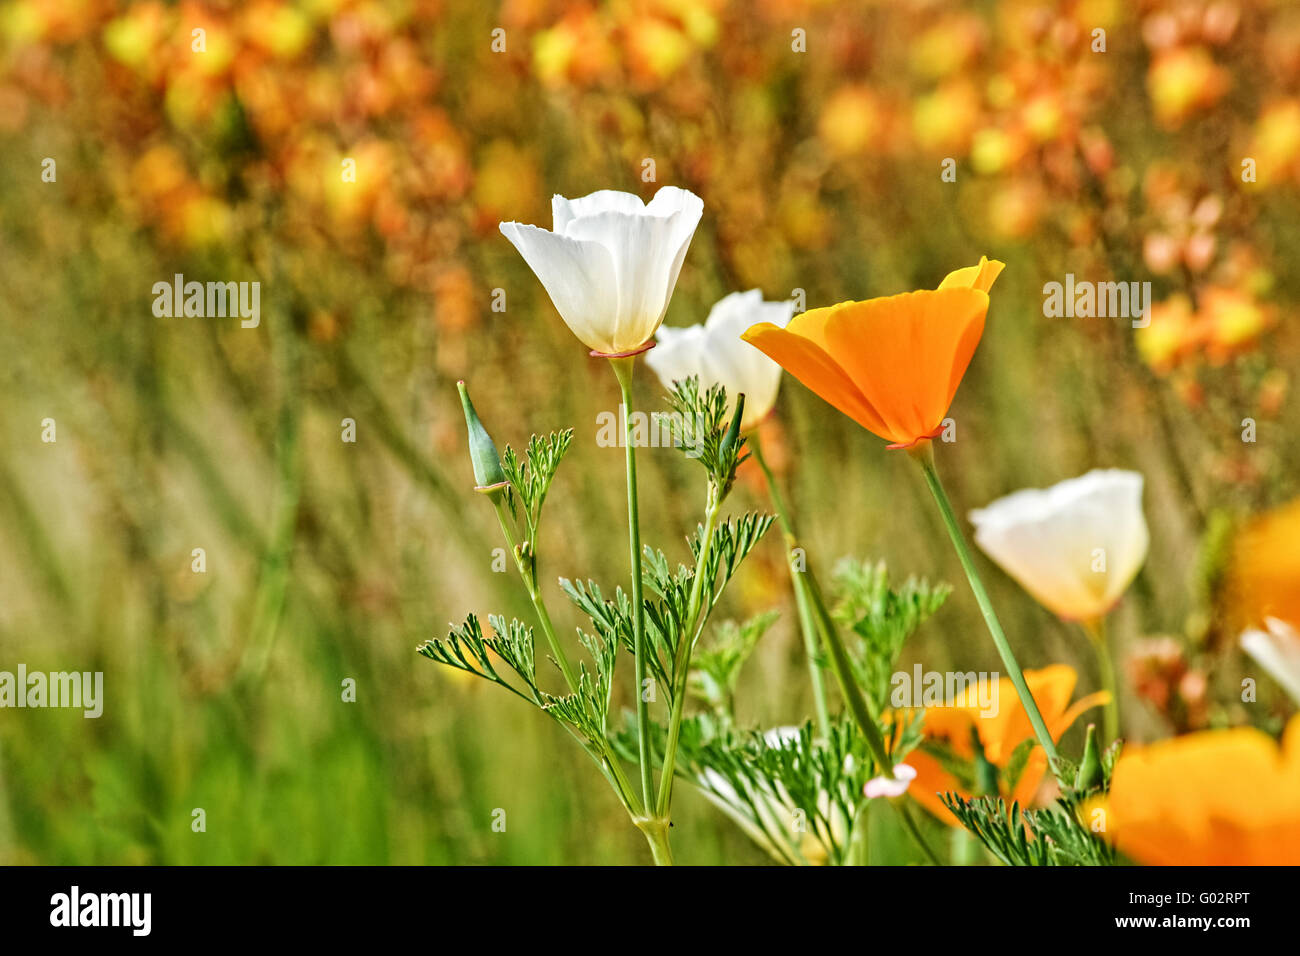 California poppy, Eschscholzia californica , white and orange flowers in nature in California - Stock Image